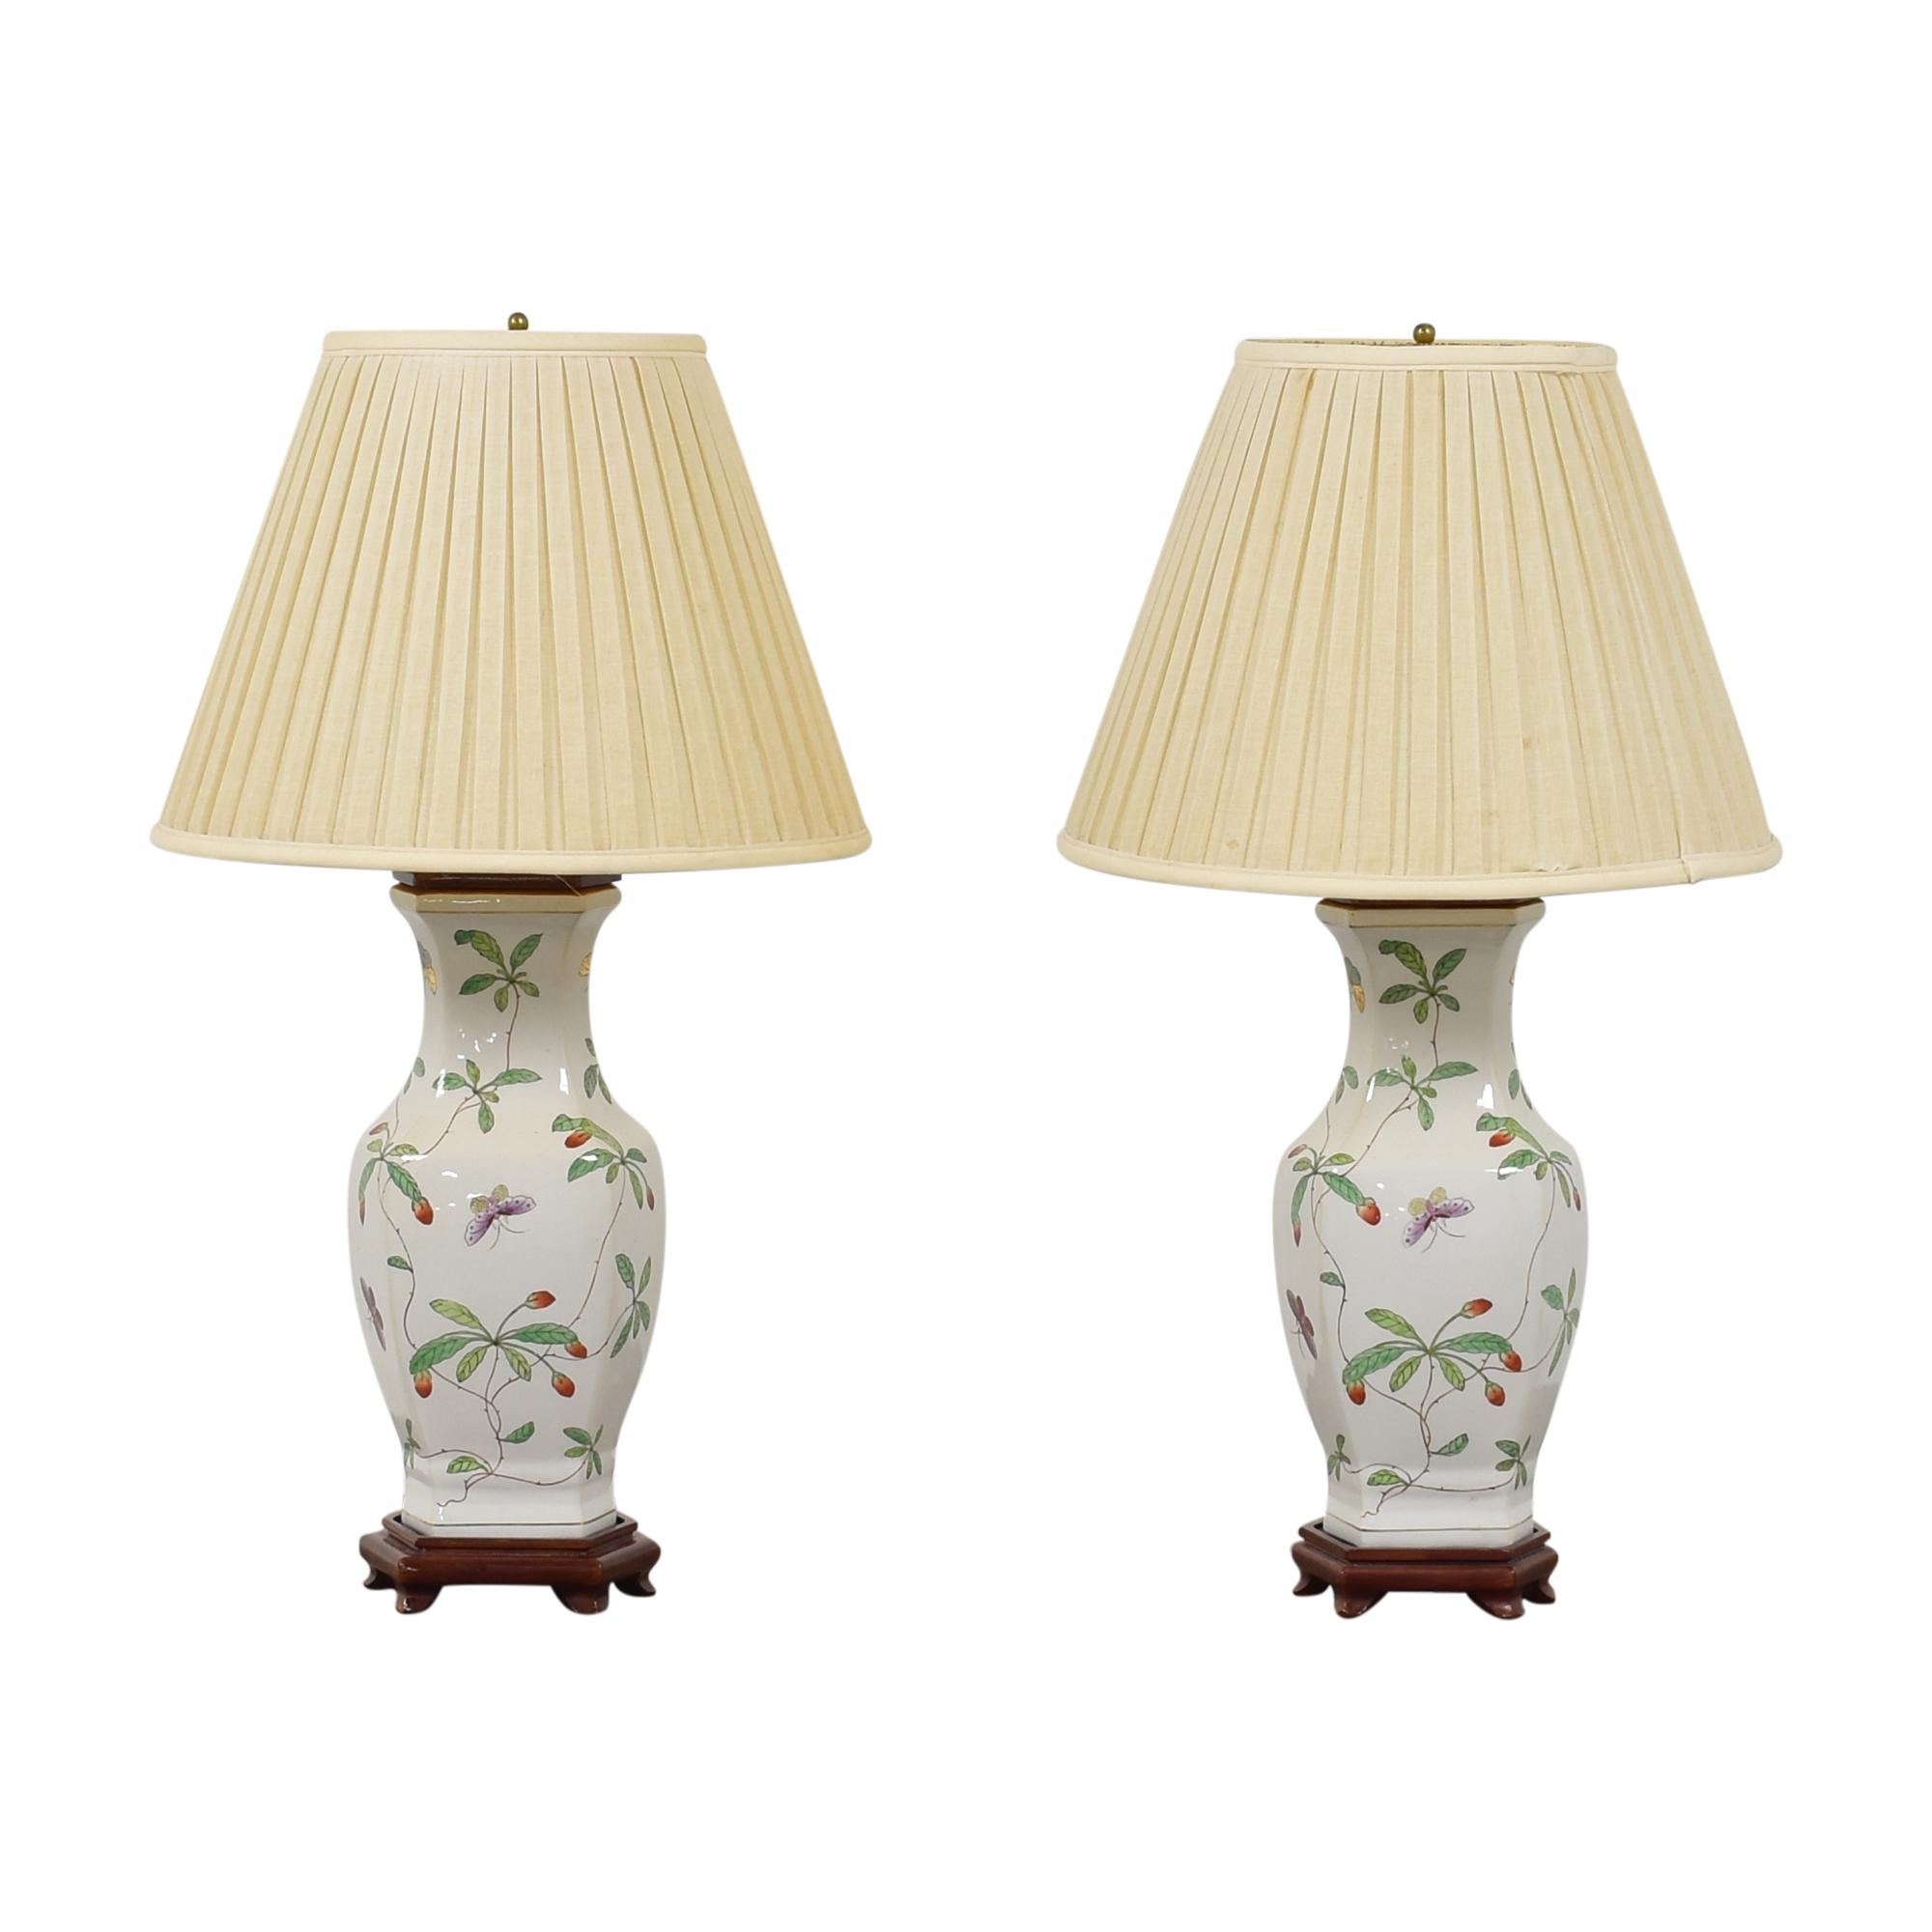 Decorative Floral Table Lamps ct